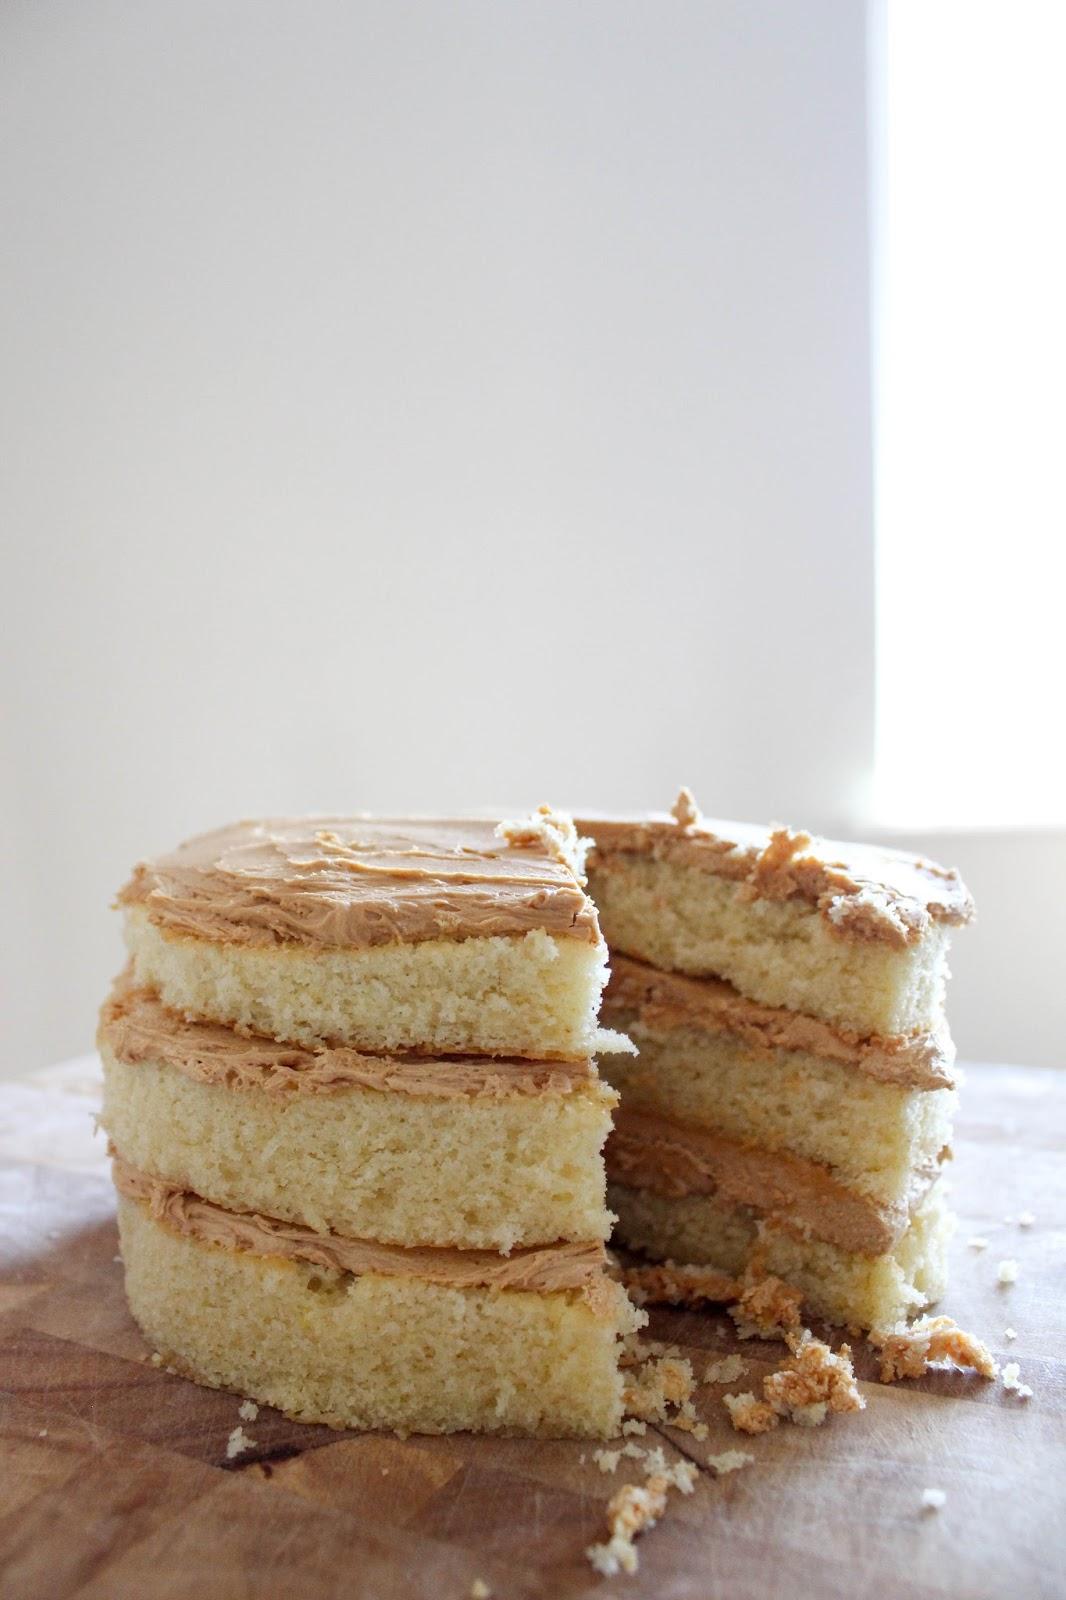 Caramlized White Chocolate Cake